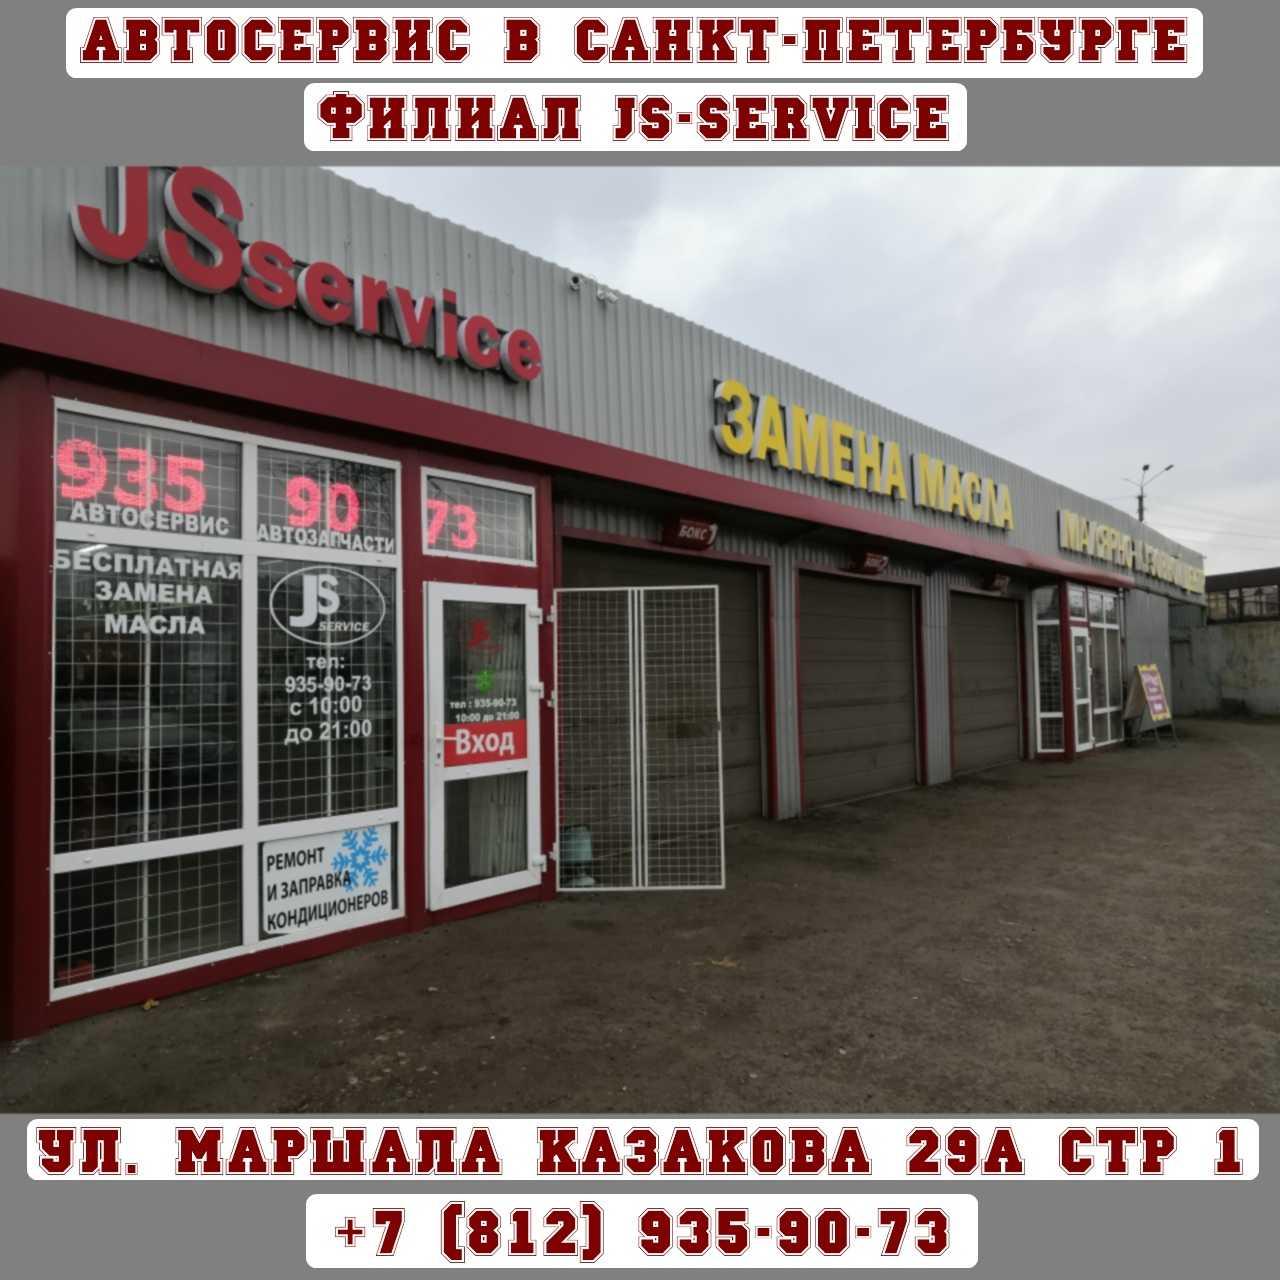 Автосервис JS-SERVICE в Санкт-Петербурге, ул. Маршала Казакова, 29 А стр 1